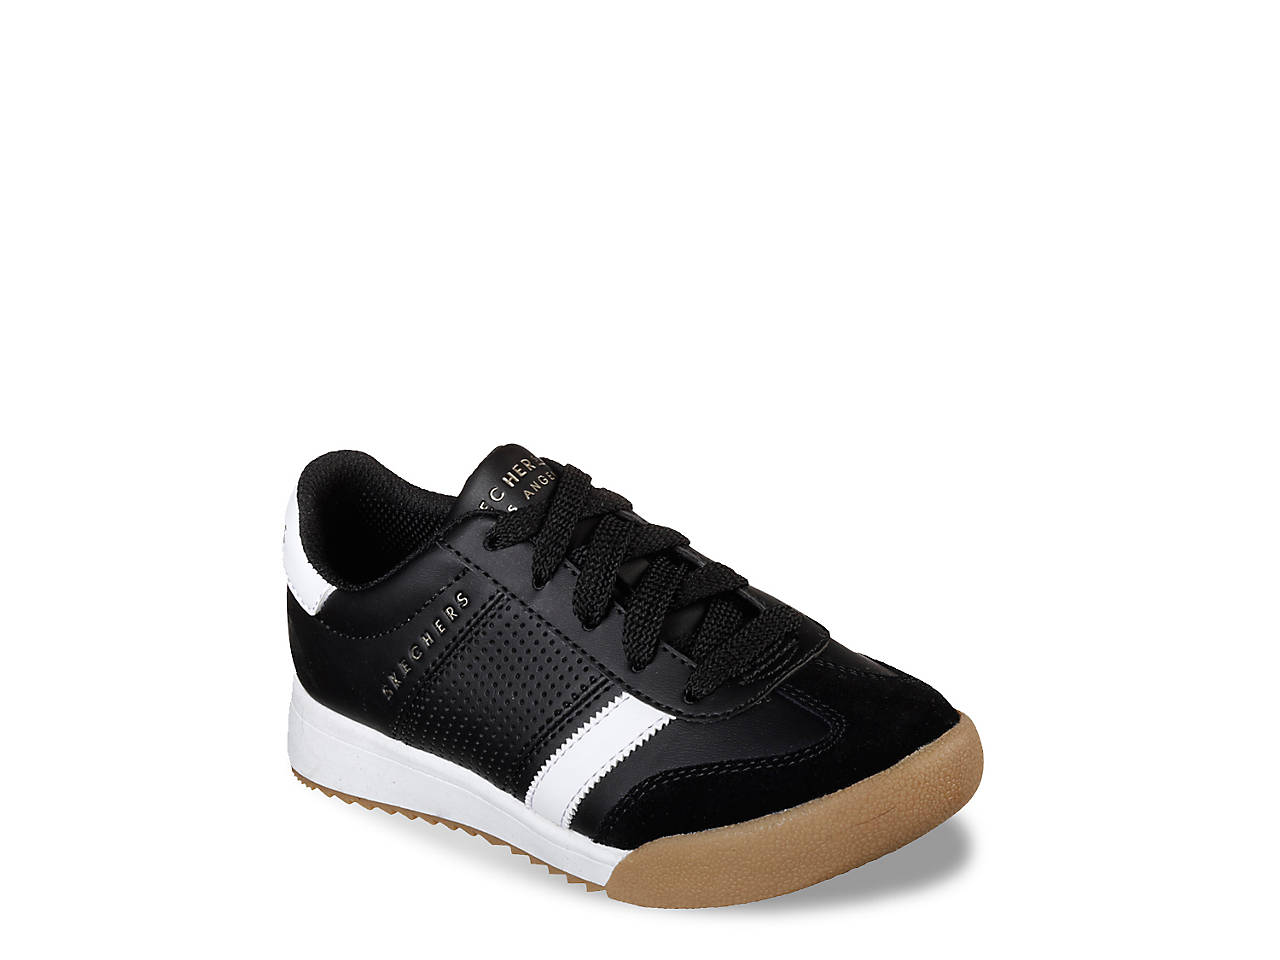 9d0d70e08f47 Skechers Zinger Toddler   Youth Sneaker Kids Shoes